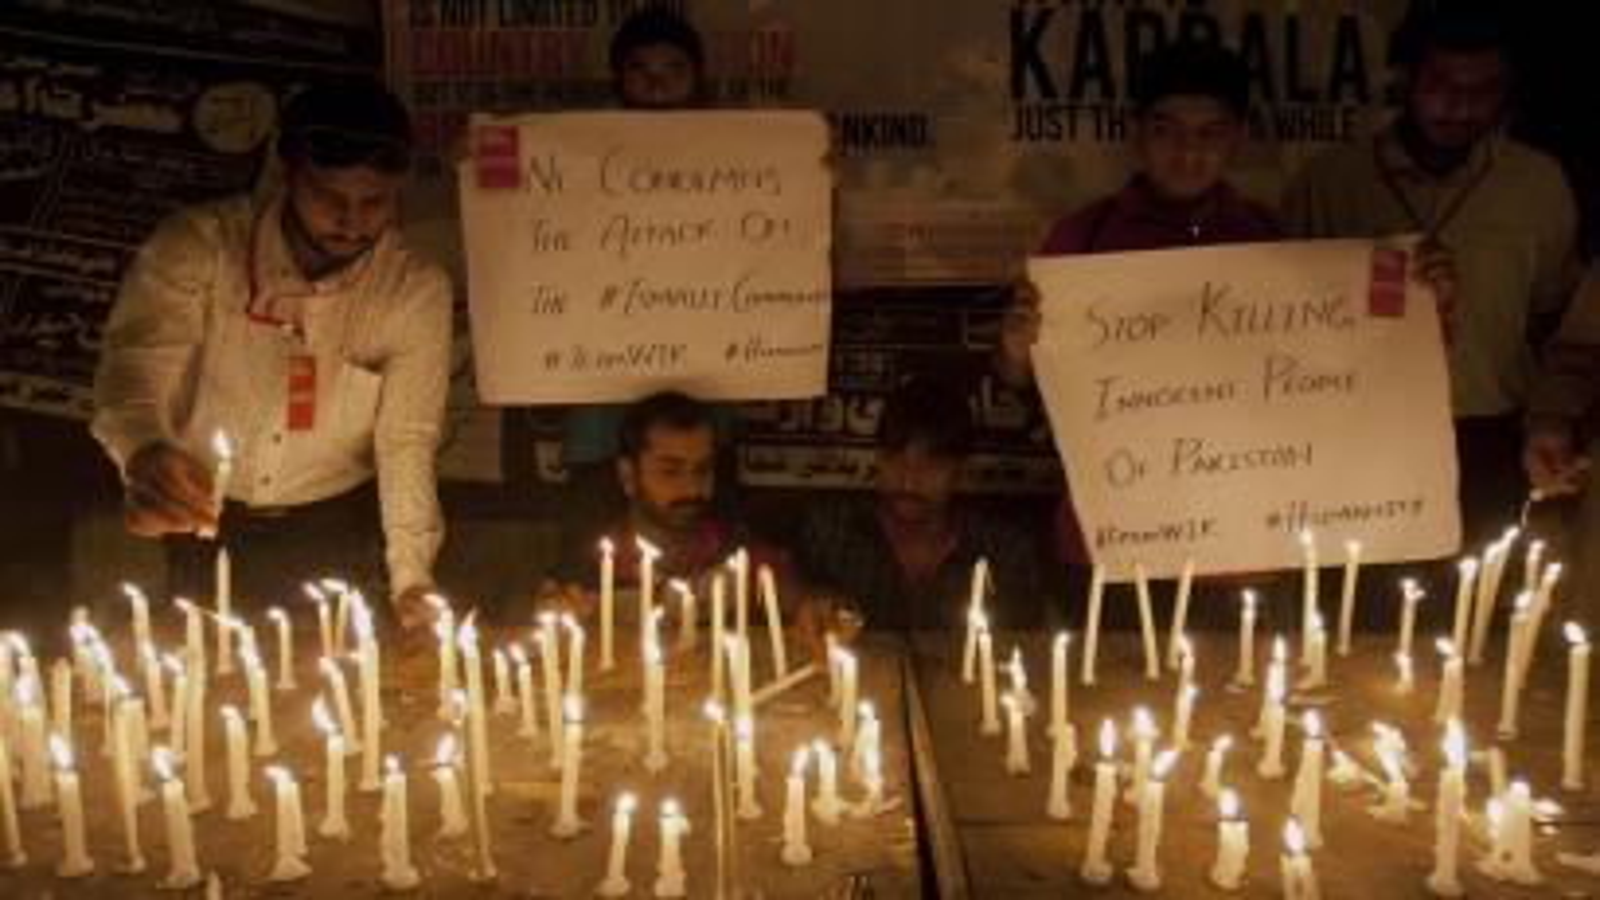 Pakistan-Karachi-Bus-Attack-Terrorism